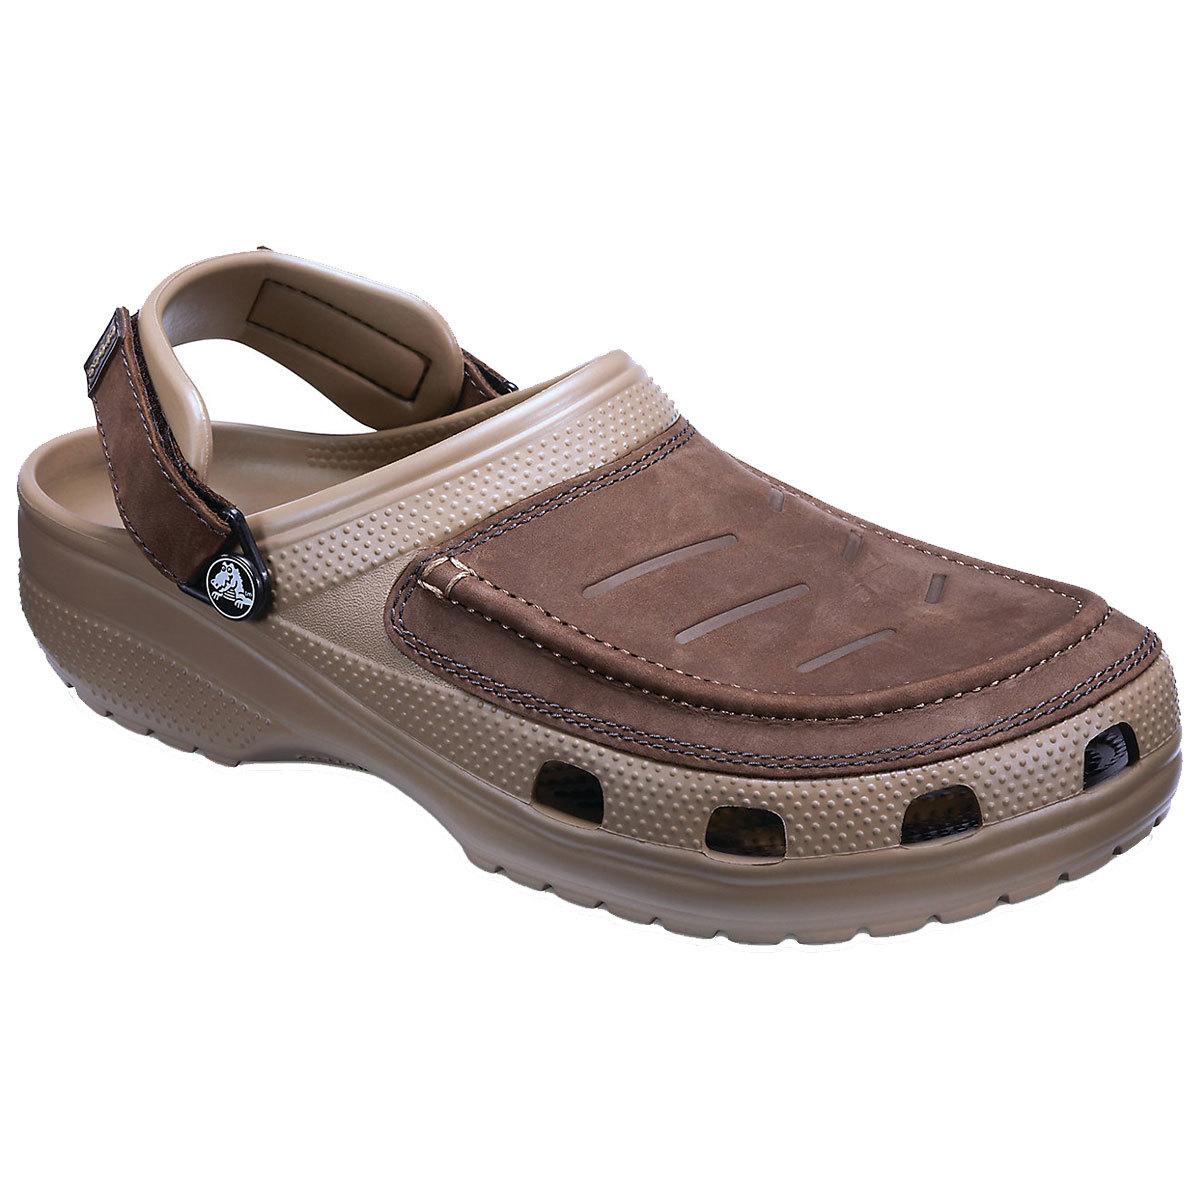 Crocs Men's Yukon Vista Clogs - Brown, 11